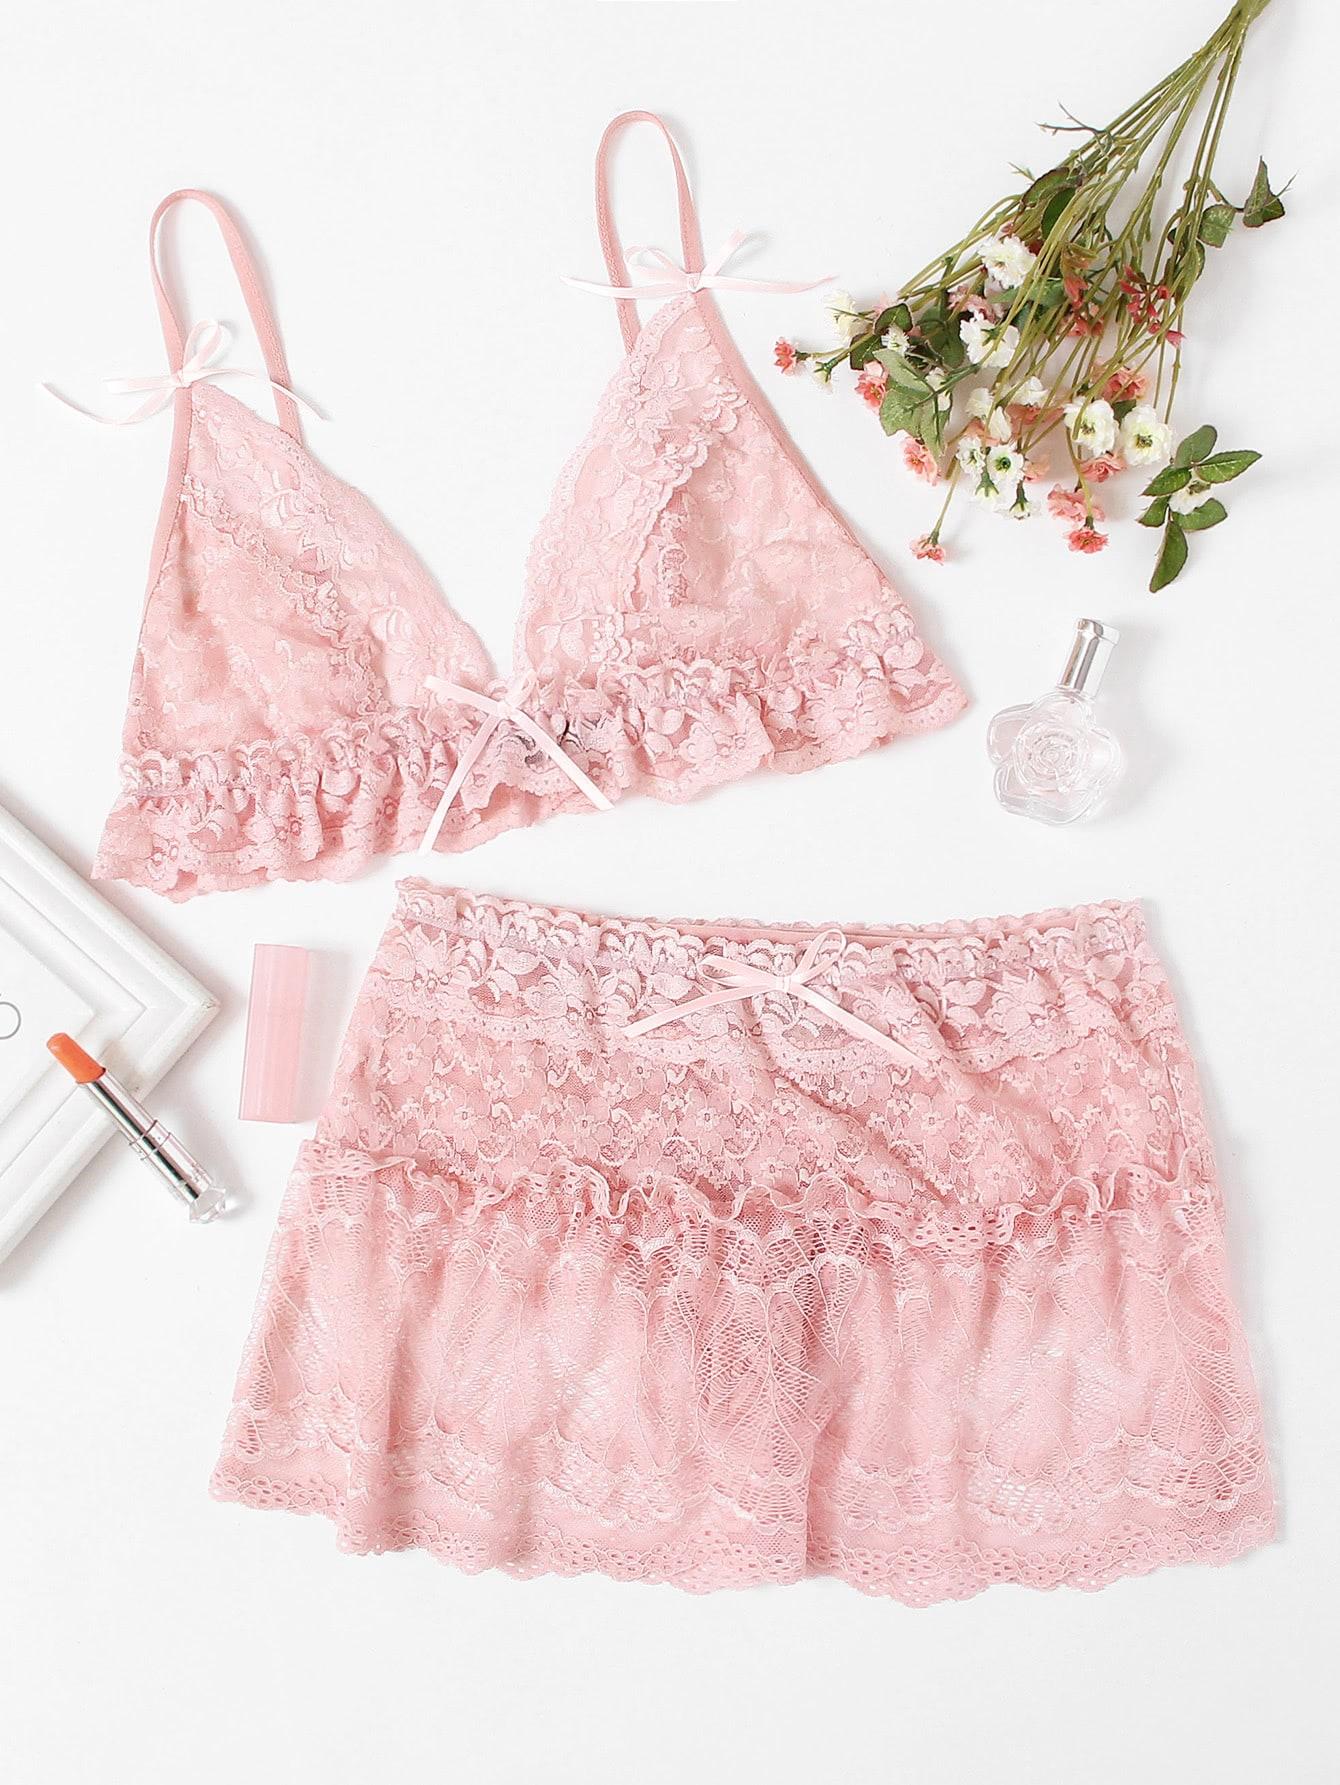 Bow Frill Hem Lace Bra & Shorts Pajama Set high low top and frill hem shorts pajama set